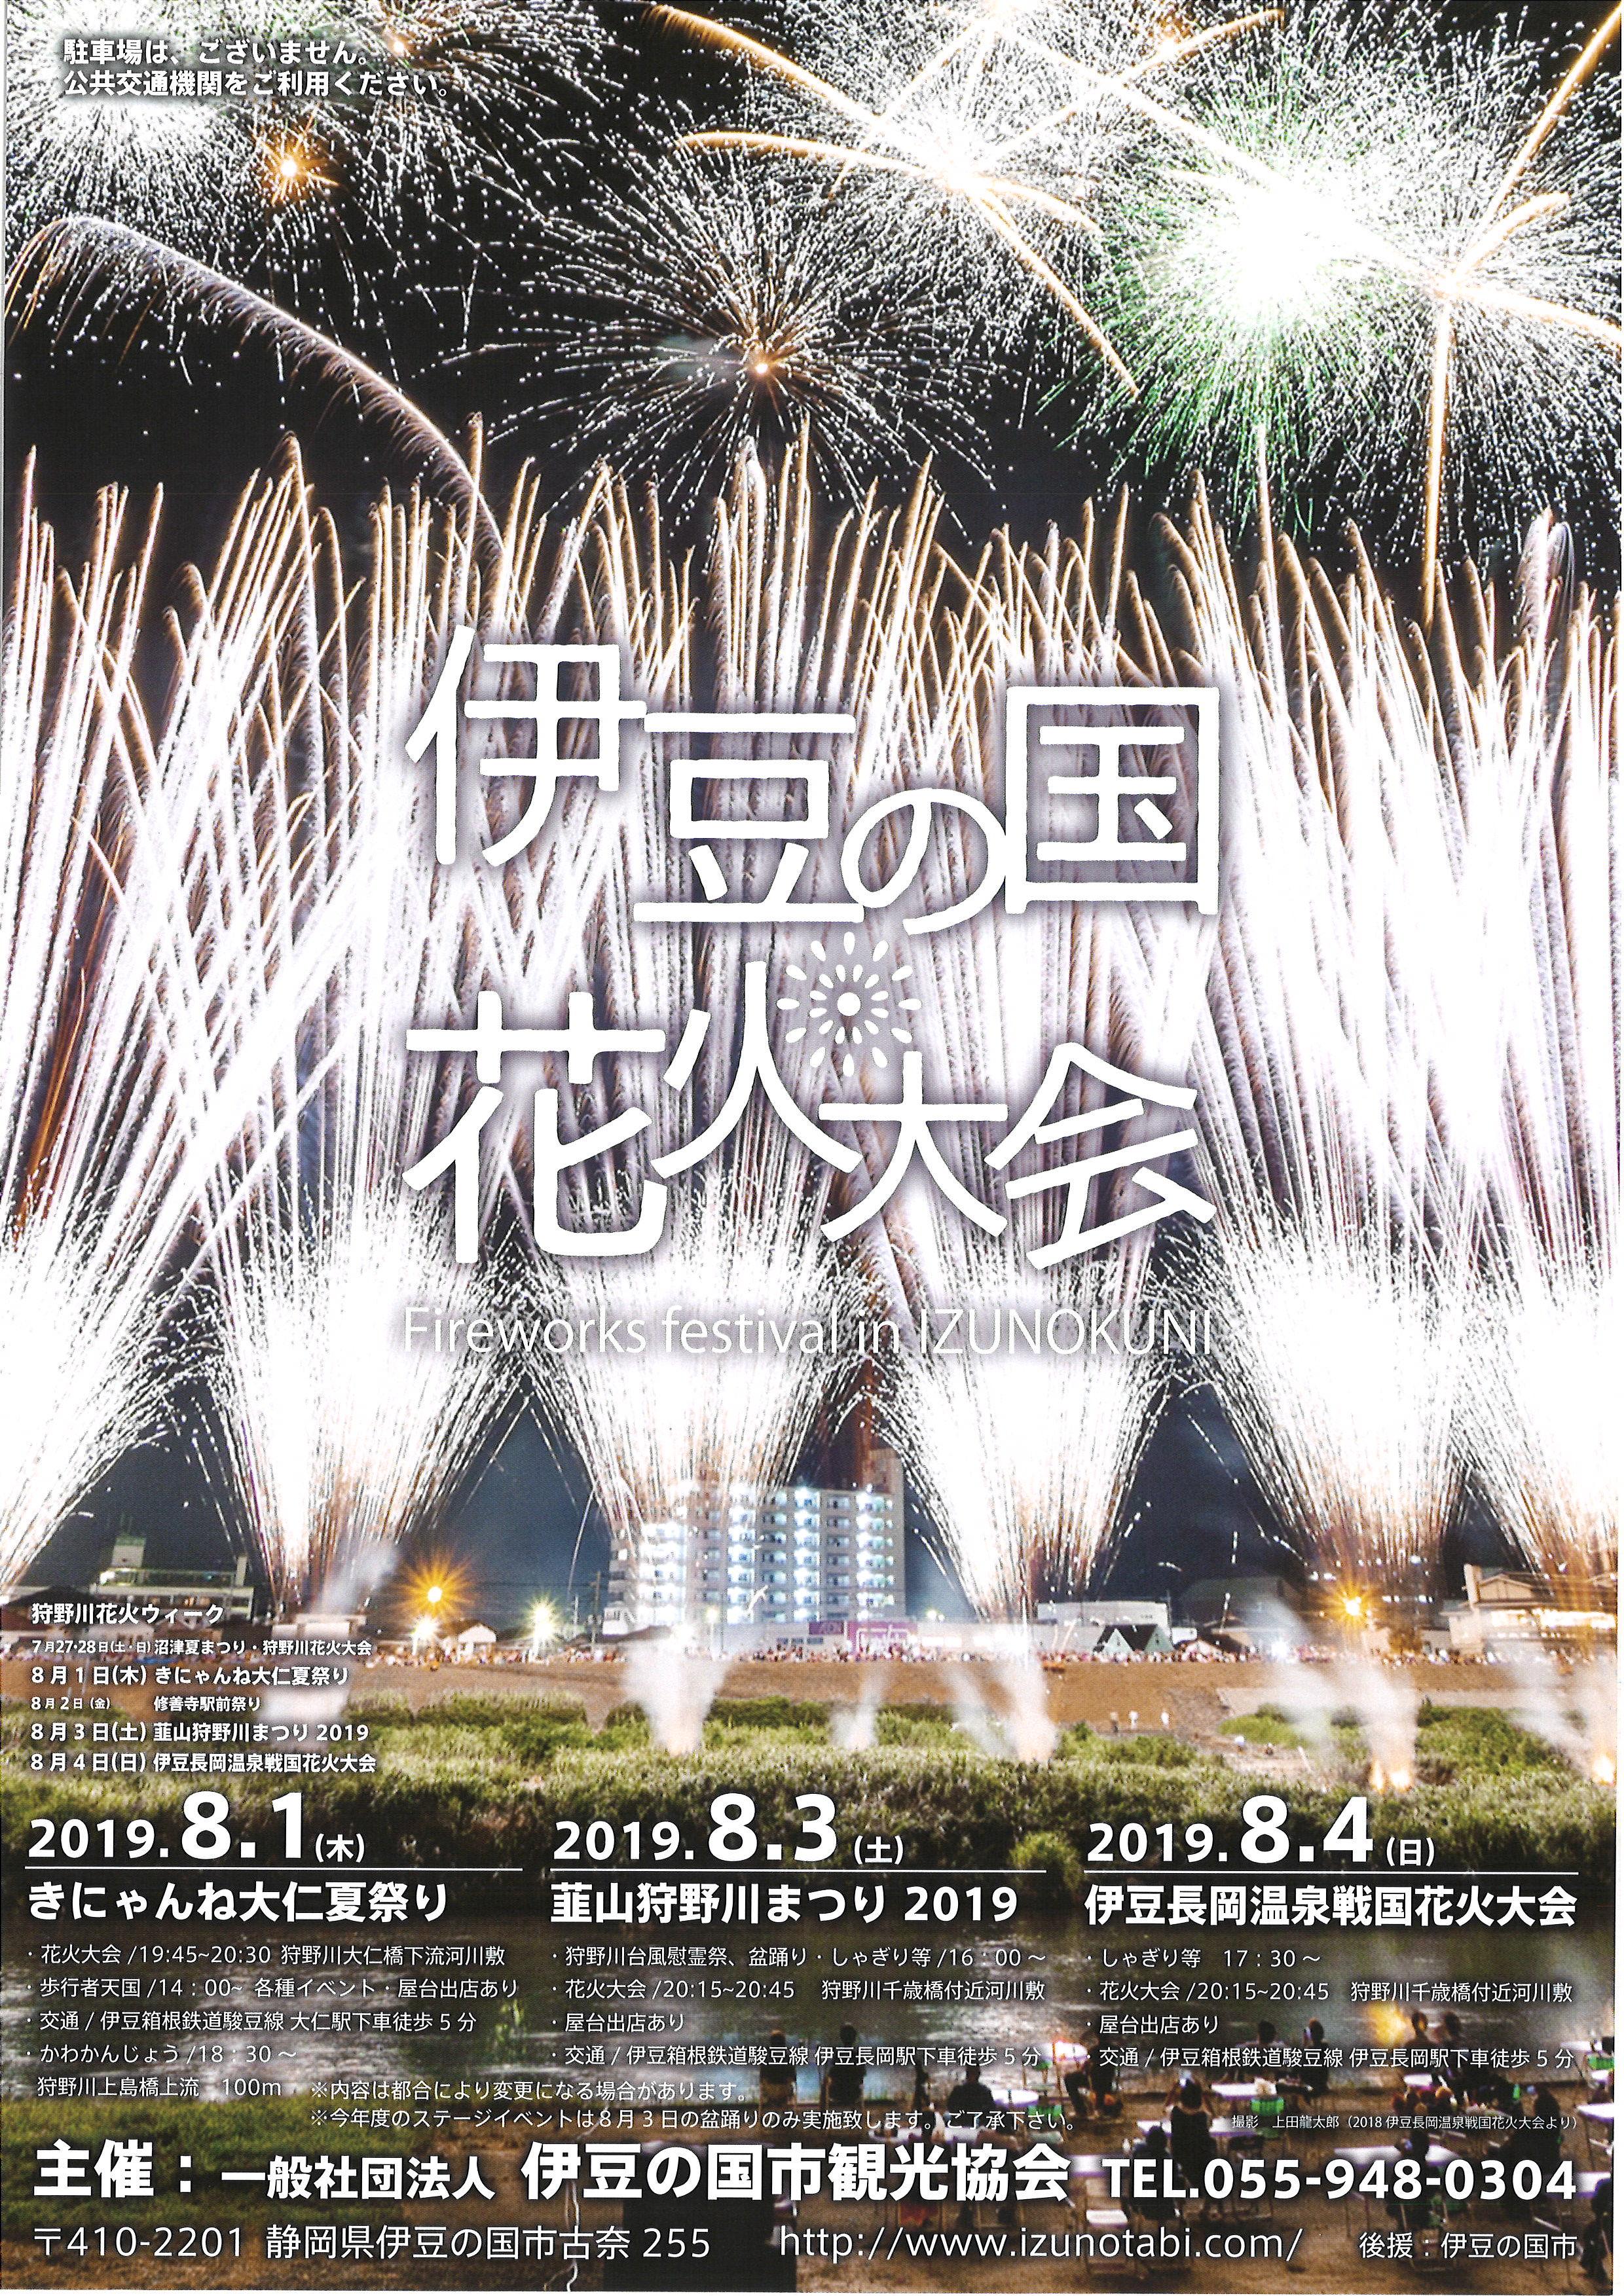 align:none link:0 alt:0 伊豆の国花火大会は8月1日・3日・4日!l